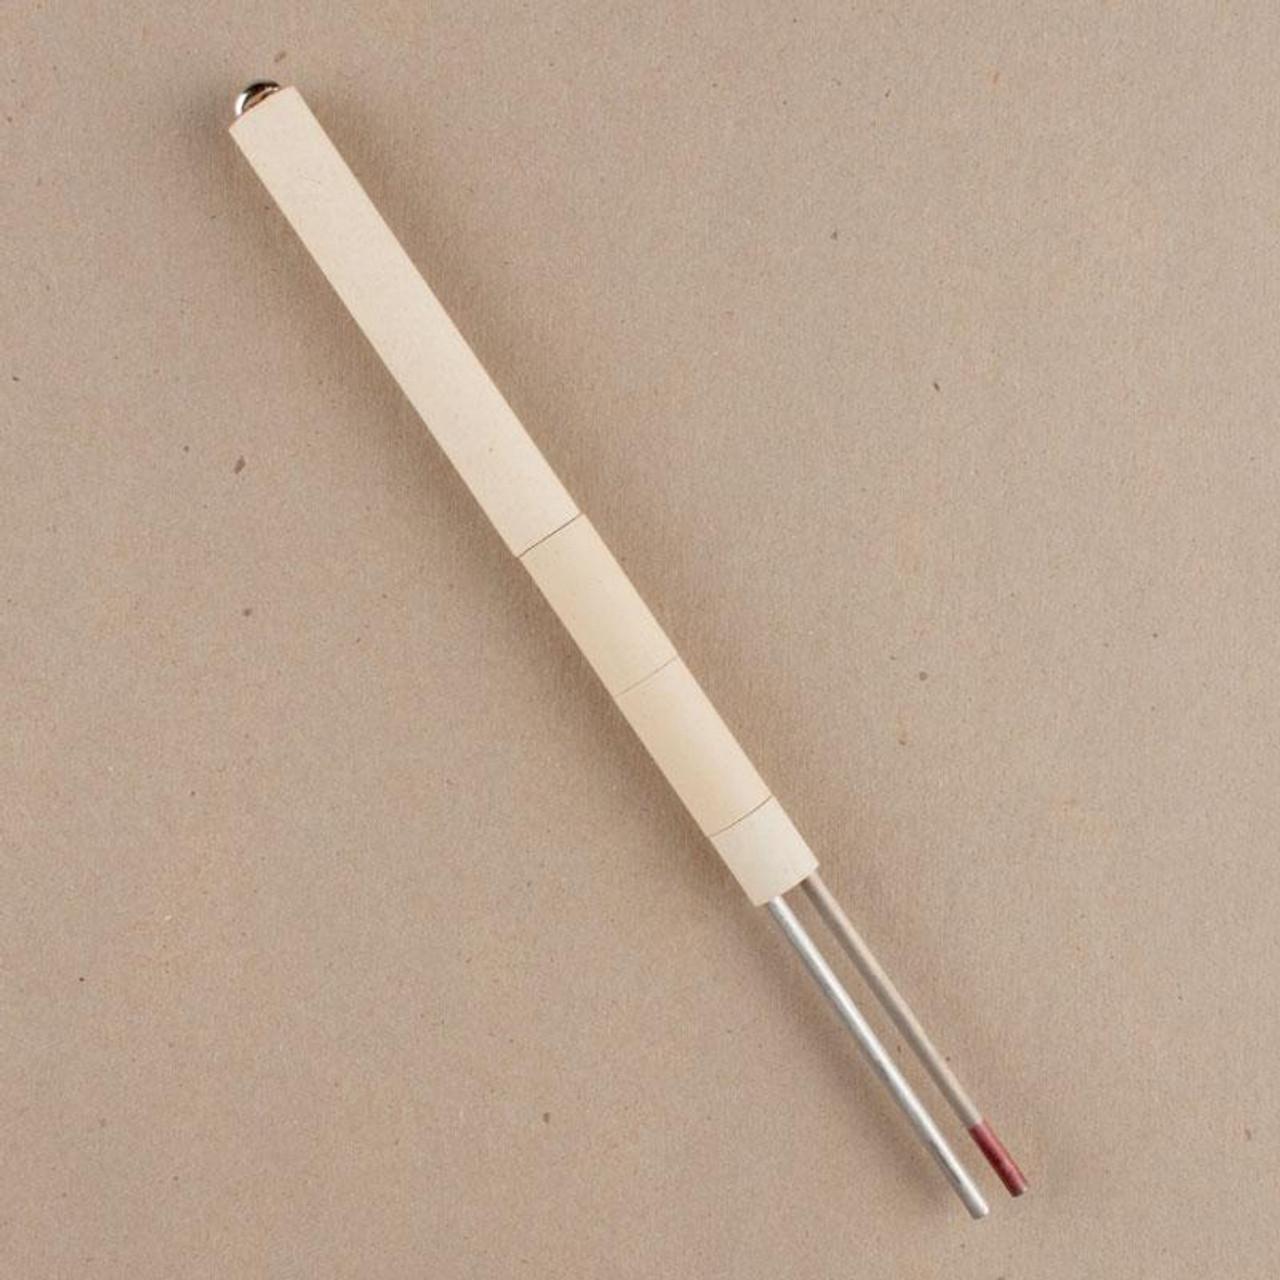 "Type K Thermocouple – 8 Gauge – 8"" Long"